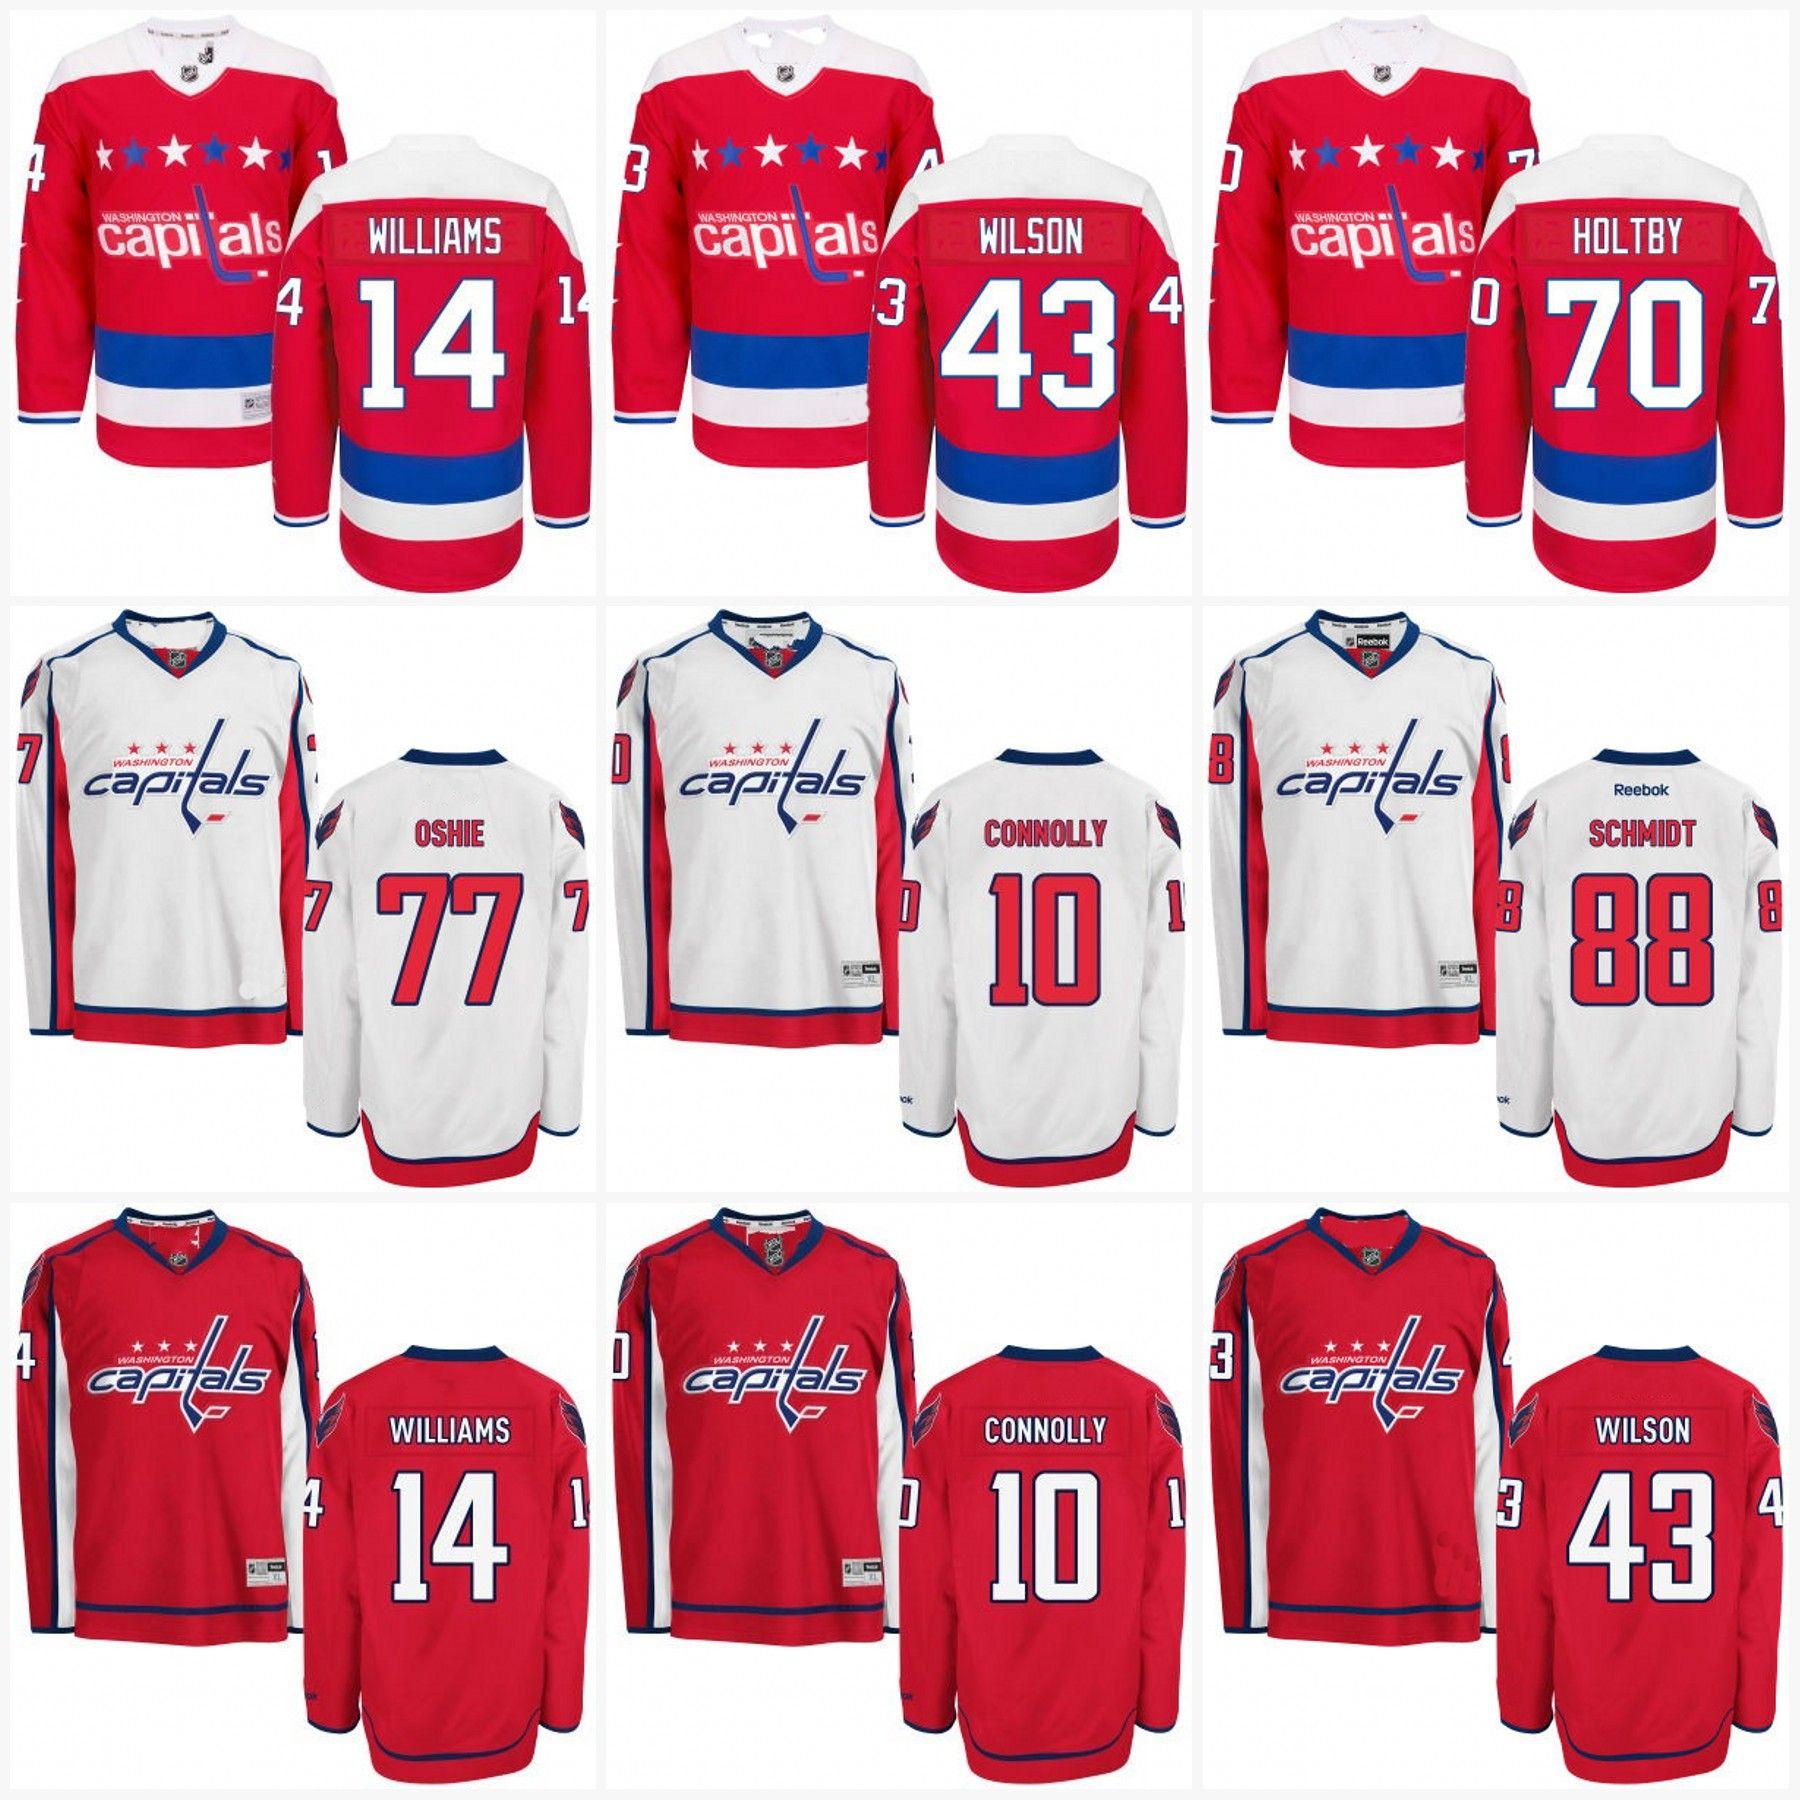 ... Authentic White Third NHL Jersey - T.J. Oshie See larger image 2017 Mens  Washington Capitals Jerseys 8 Alex Ovechkin 77 Tj Oshie Andre Burakovsky 43  Tom ... dada36cb9